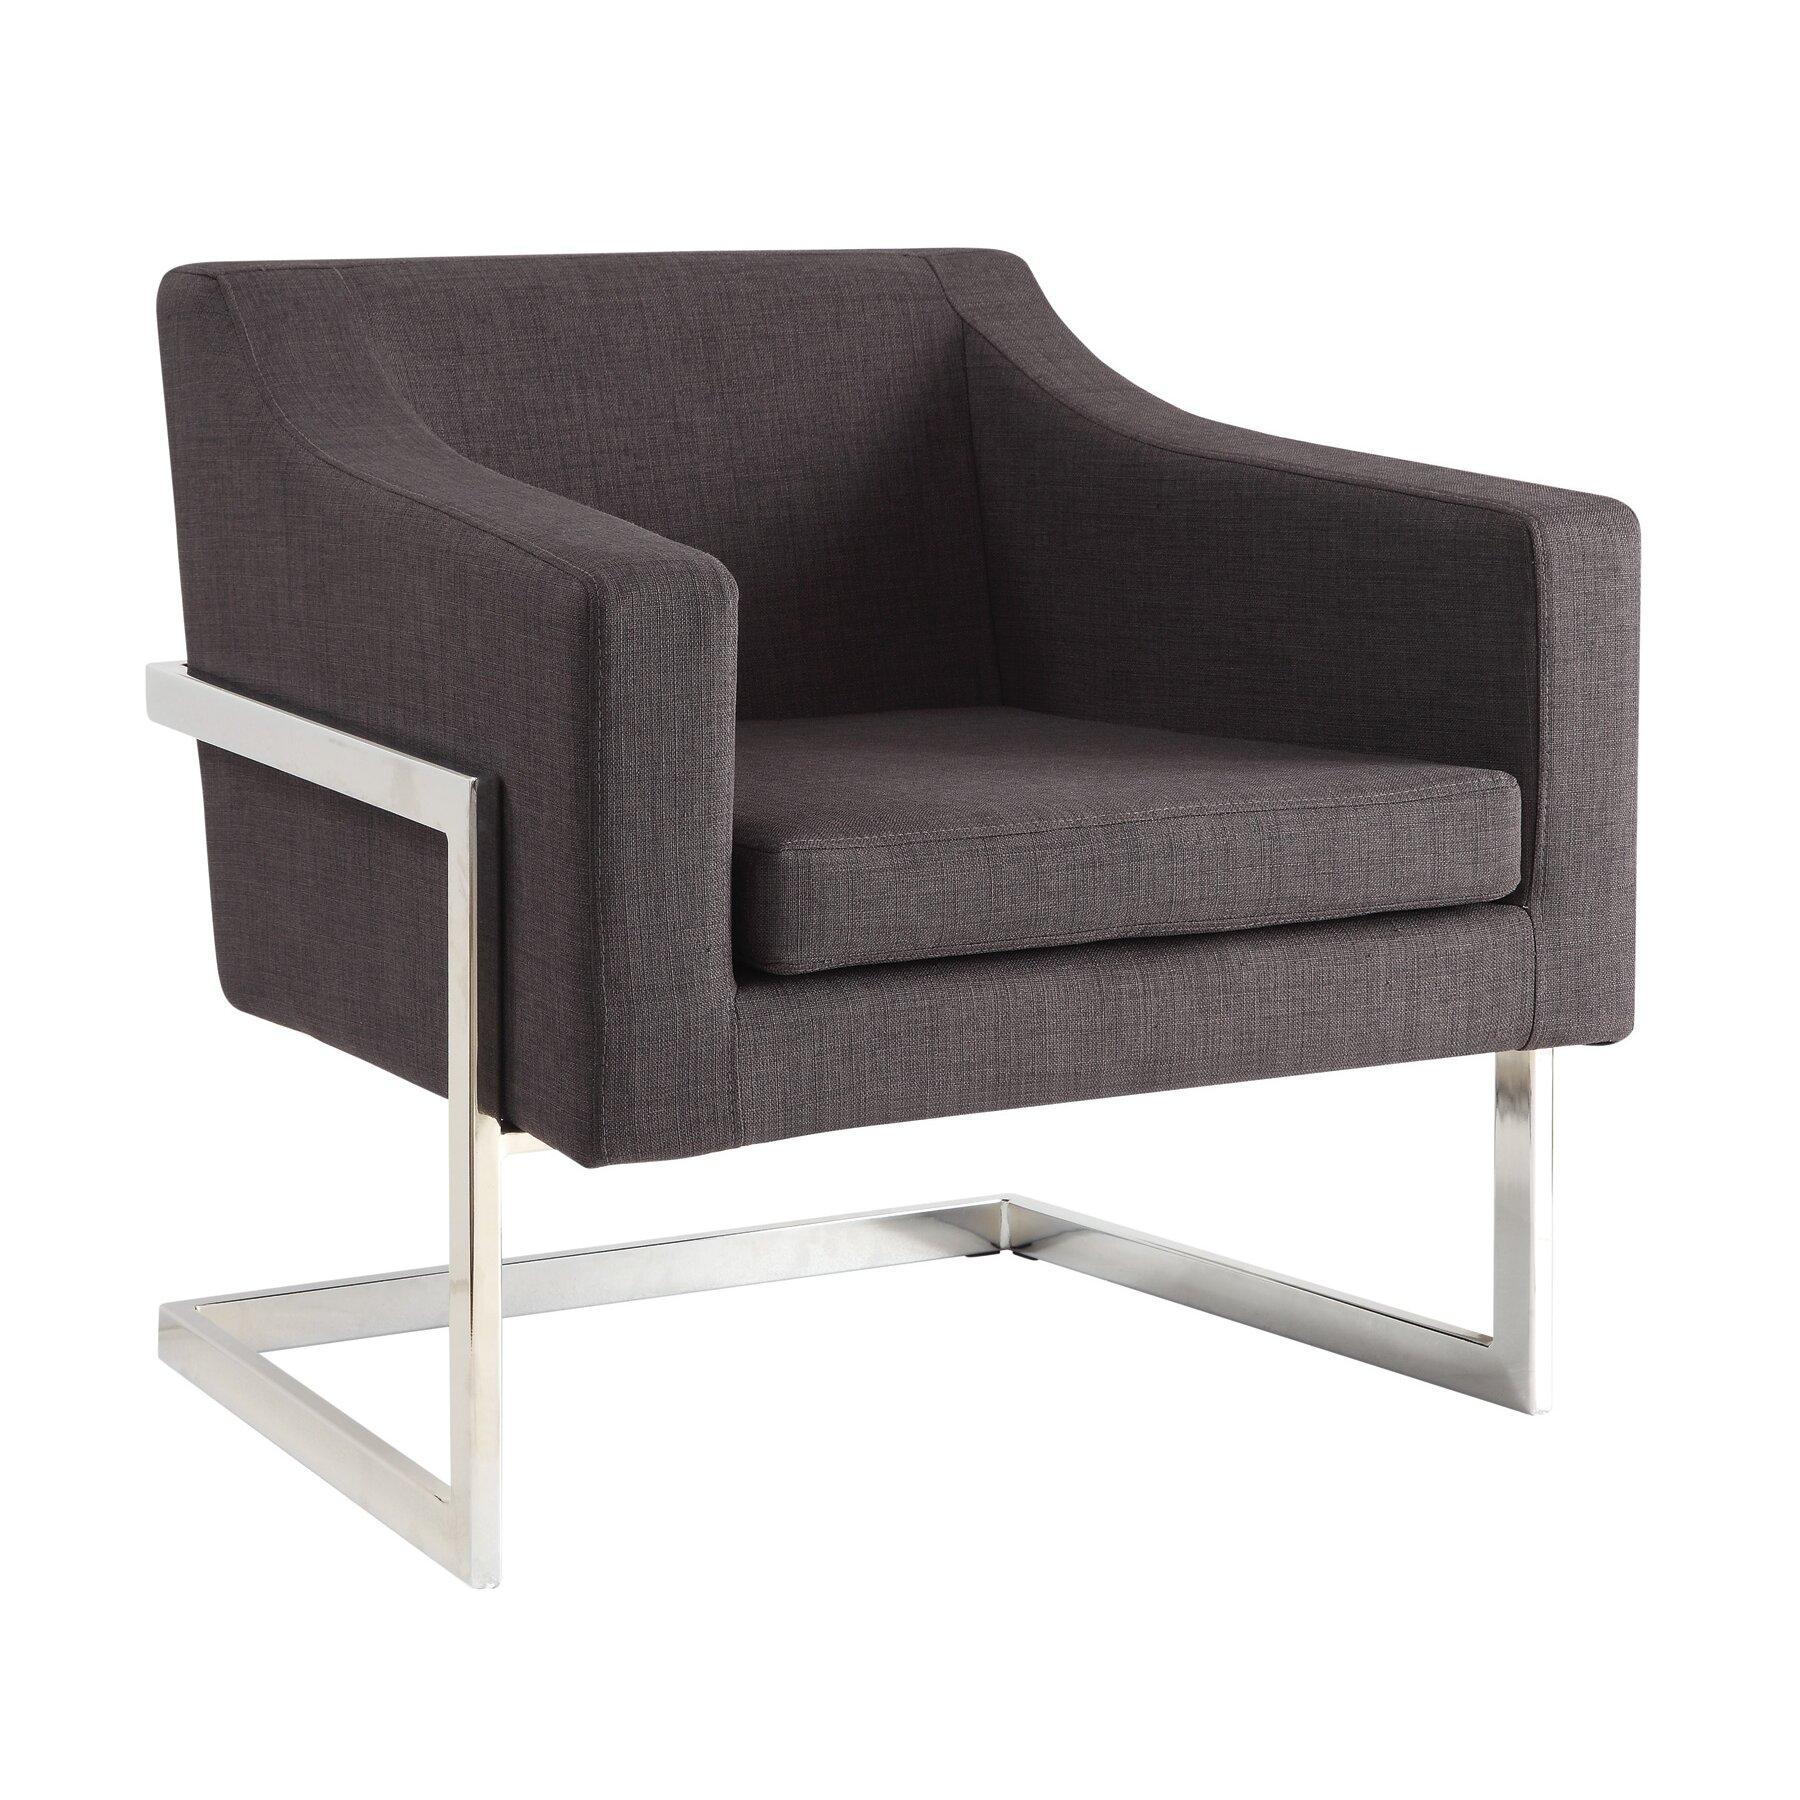 wade logan zachary contemporary arm chair reviews wayfair. Black Bedroom Furniture Sets. Home Design Ideas